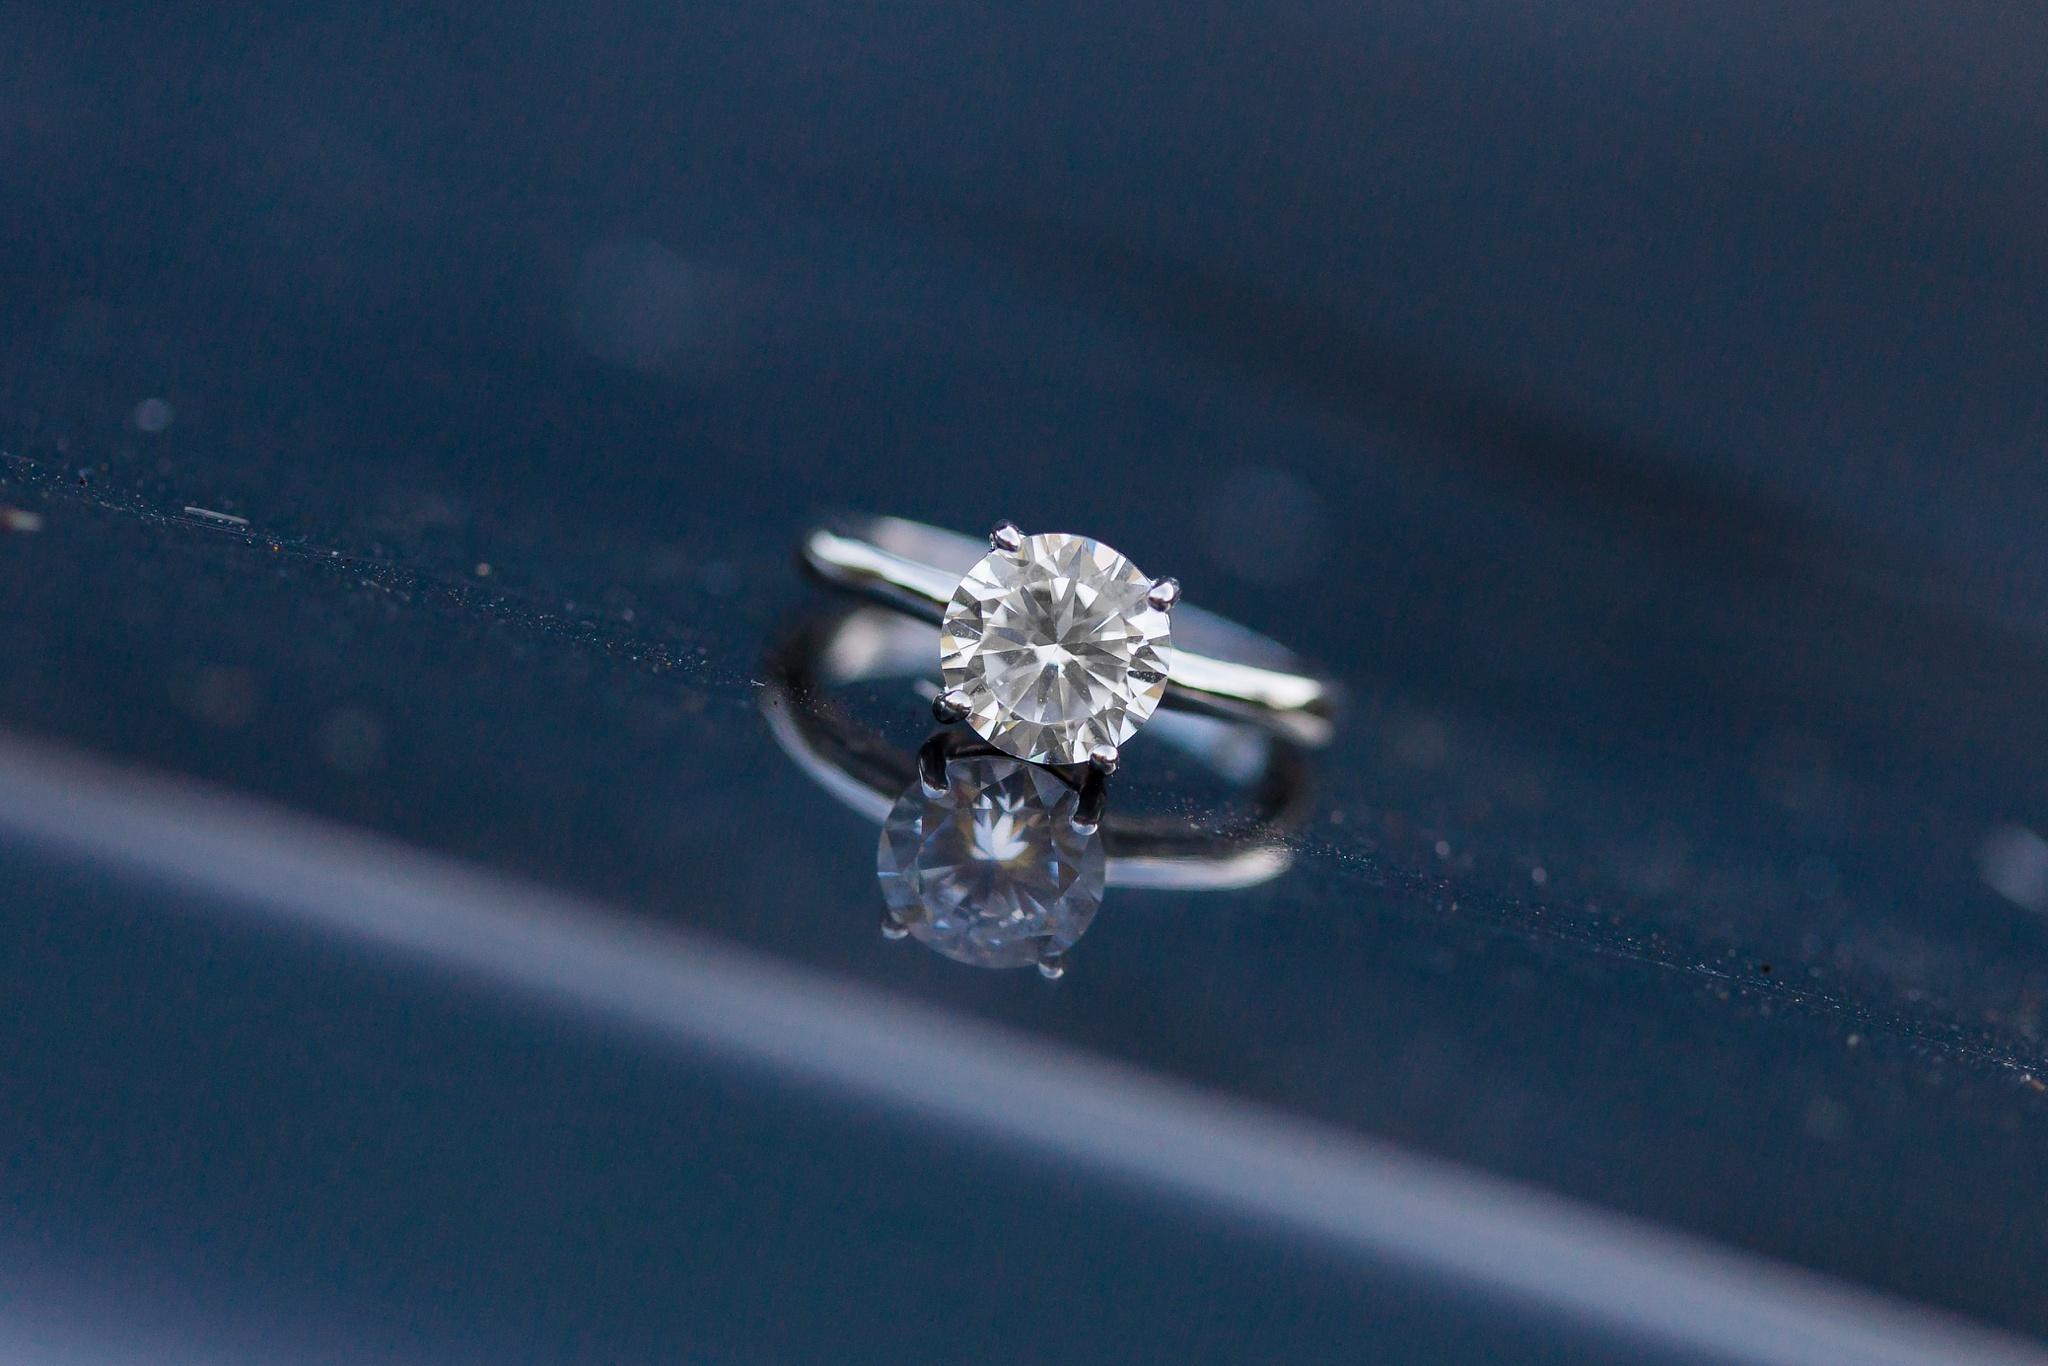 100mm Macro | Lens Love | Cinnamon Wolfe Photography | NJ Wedding Photography